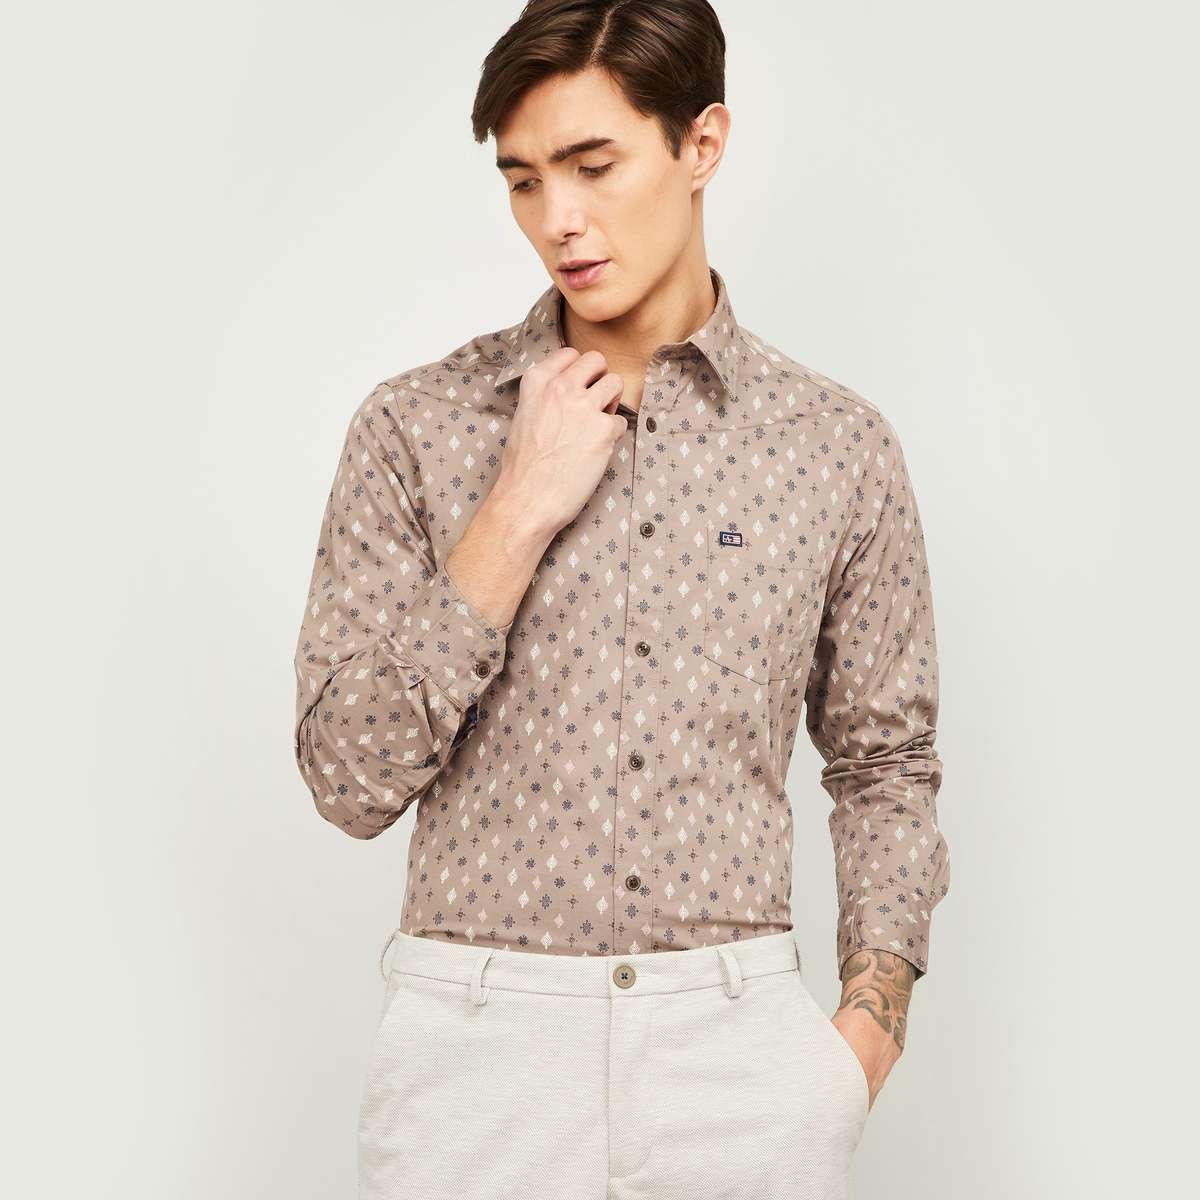 10.ARROW SPORTS Men Printed Full Sleeves Slim Fit Casual Shirt